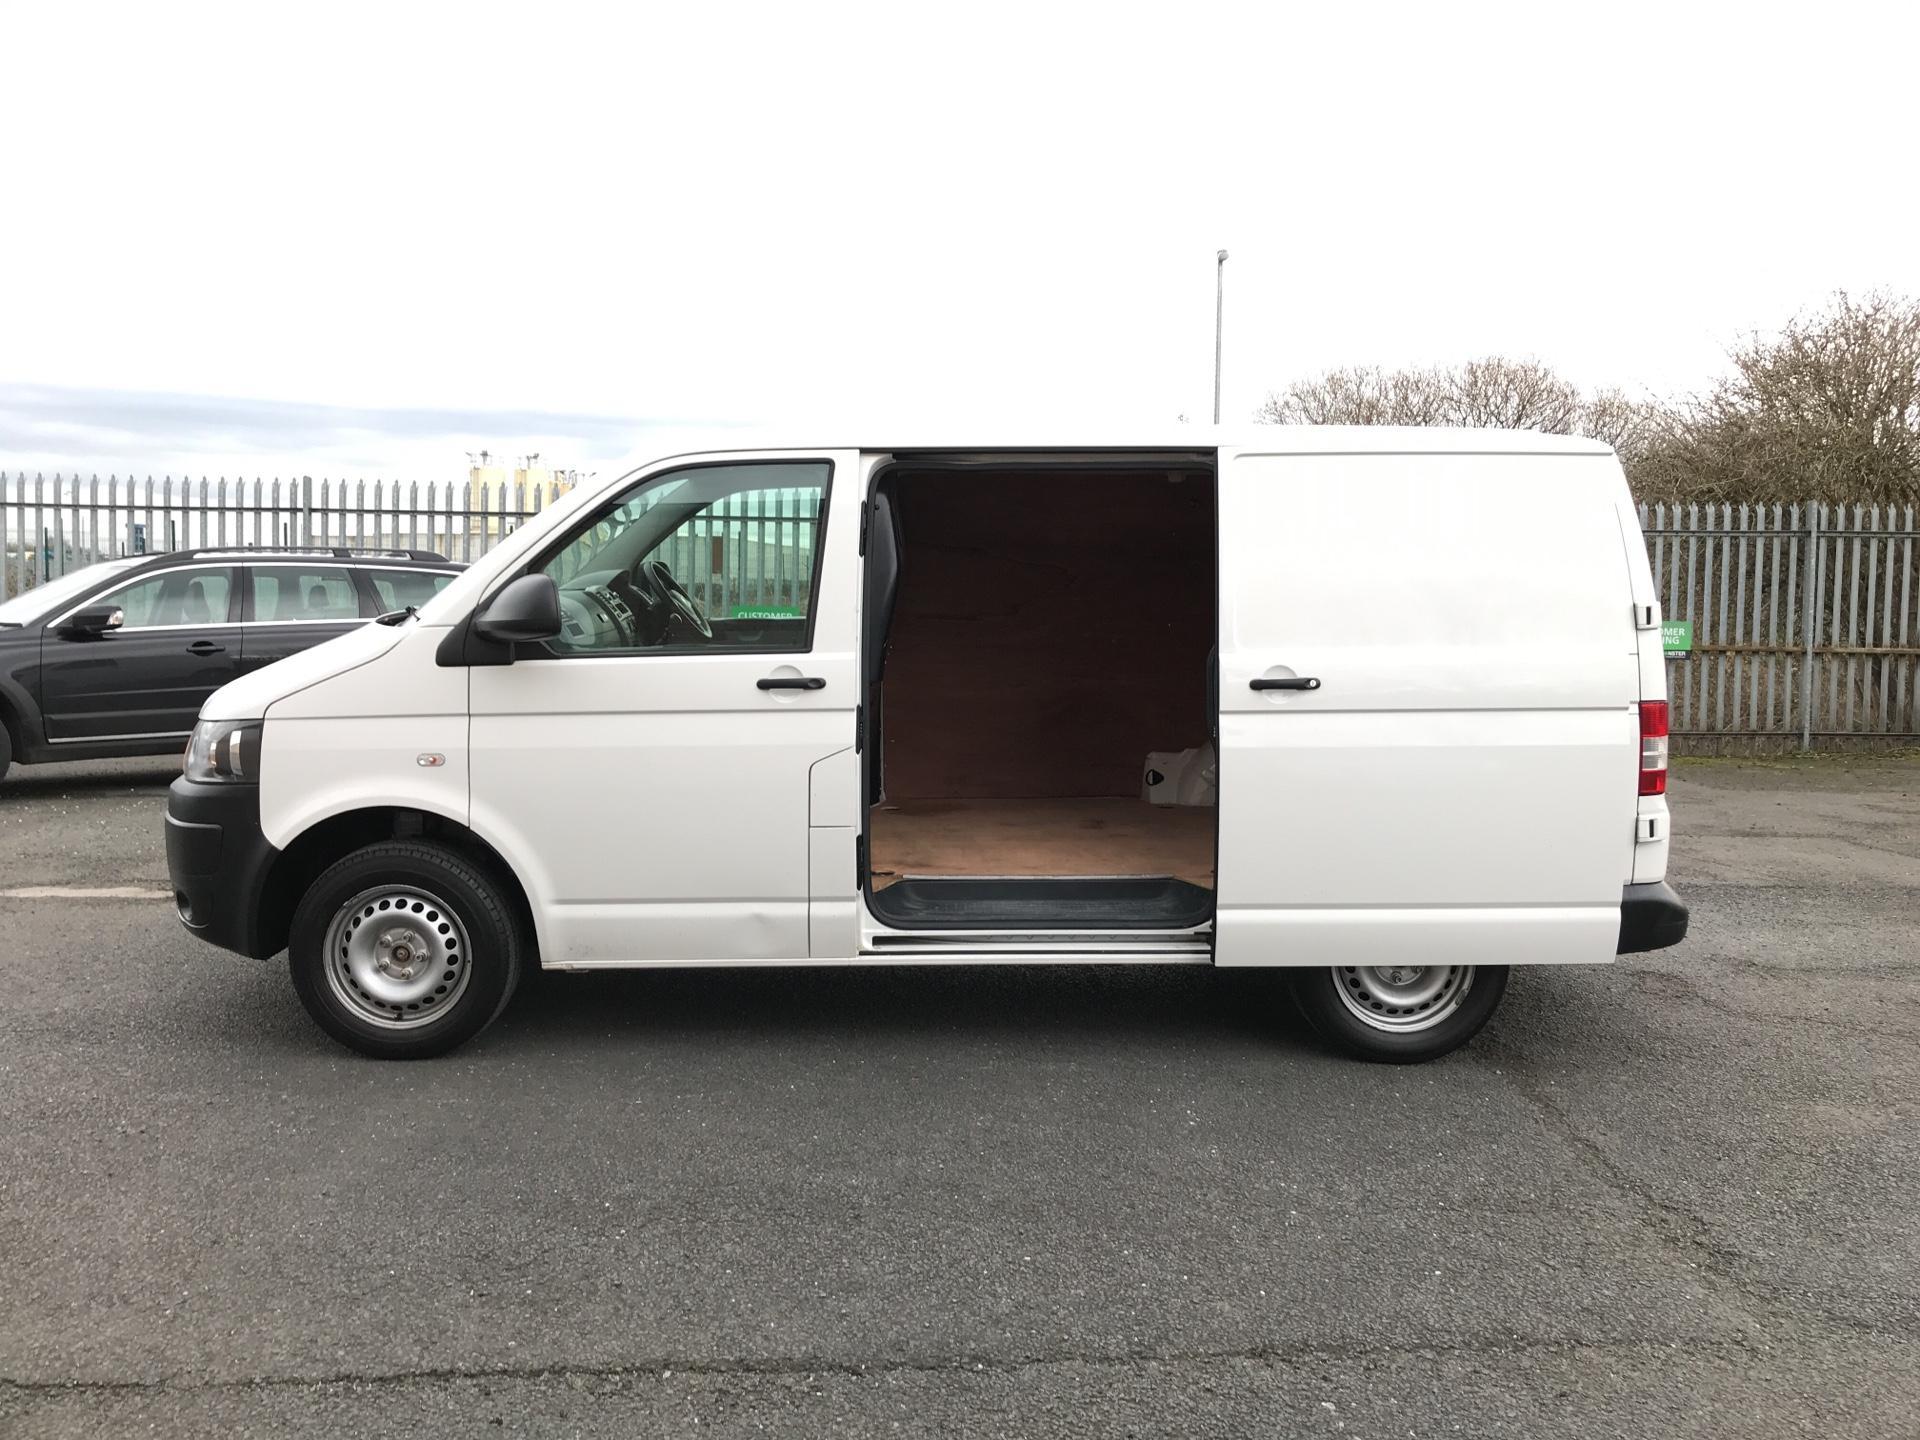 2014 Volkswagen Transporter  T28 SWB DIESEL 2.0 TDI 102PS STARTLINE EURO 5 *VALUE RANGE VEHICLE - CONDITION REFLECTED IN PRICE*  (NL64VEF) Image 18